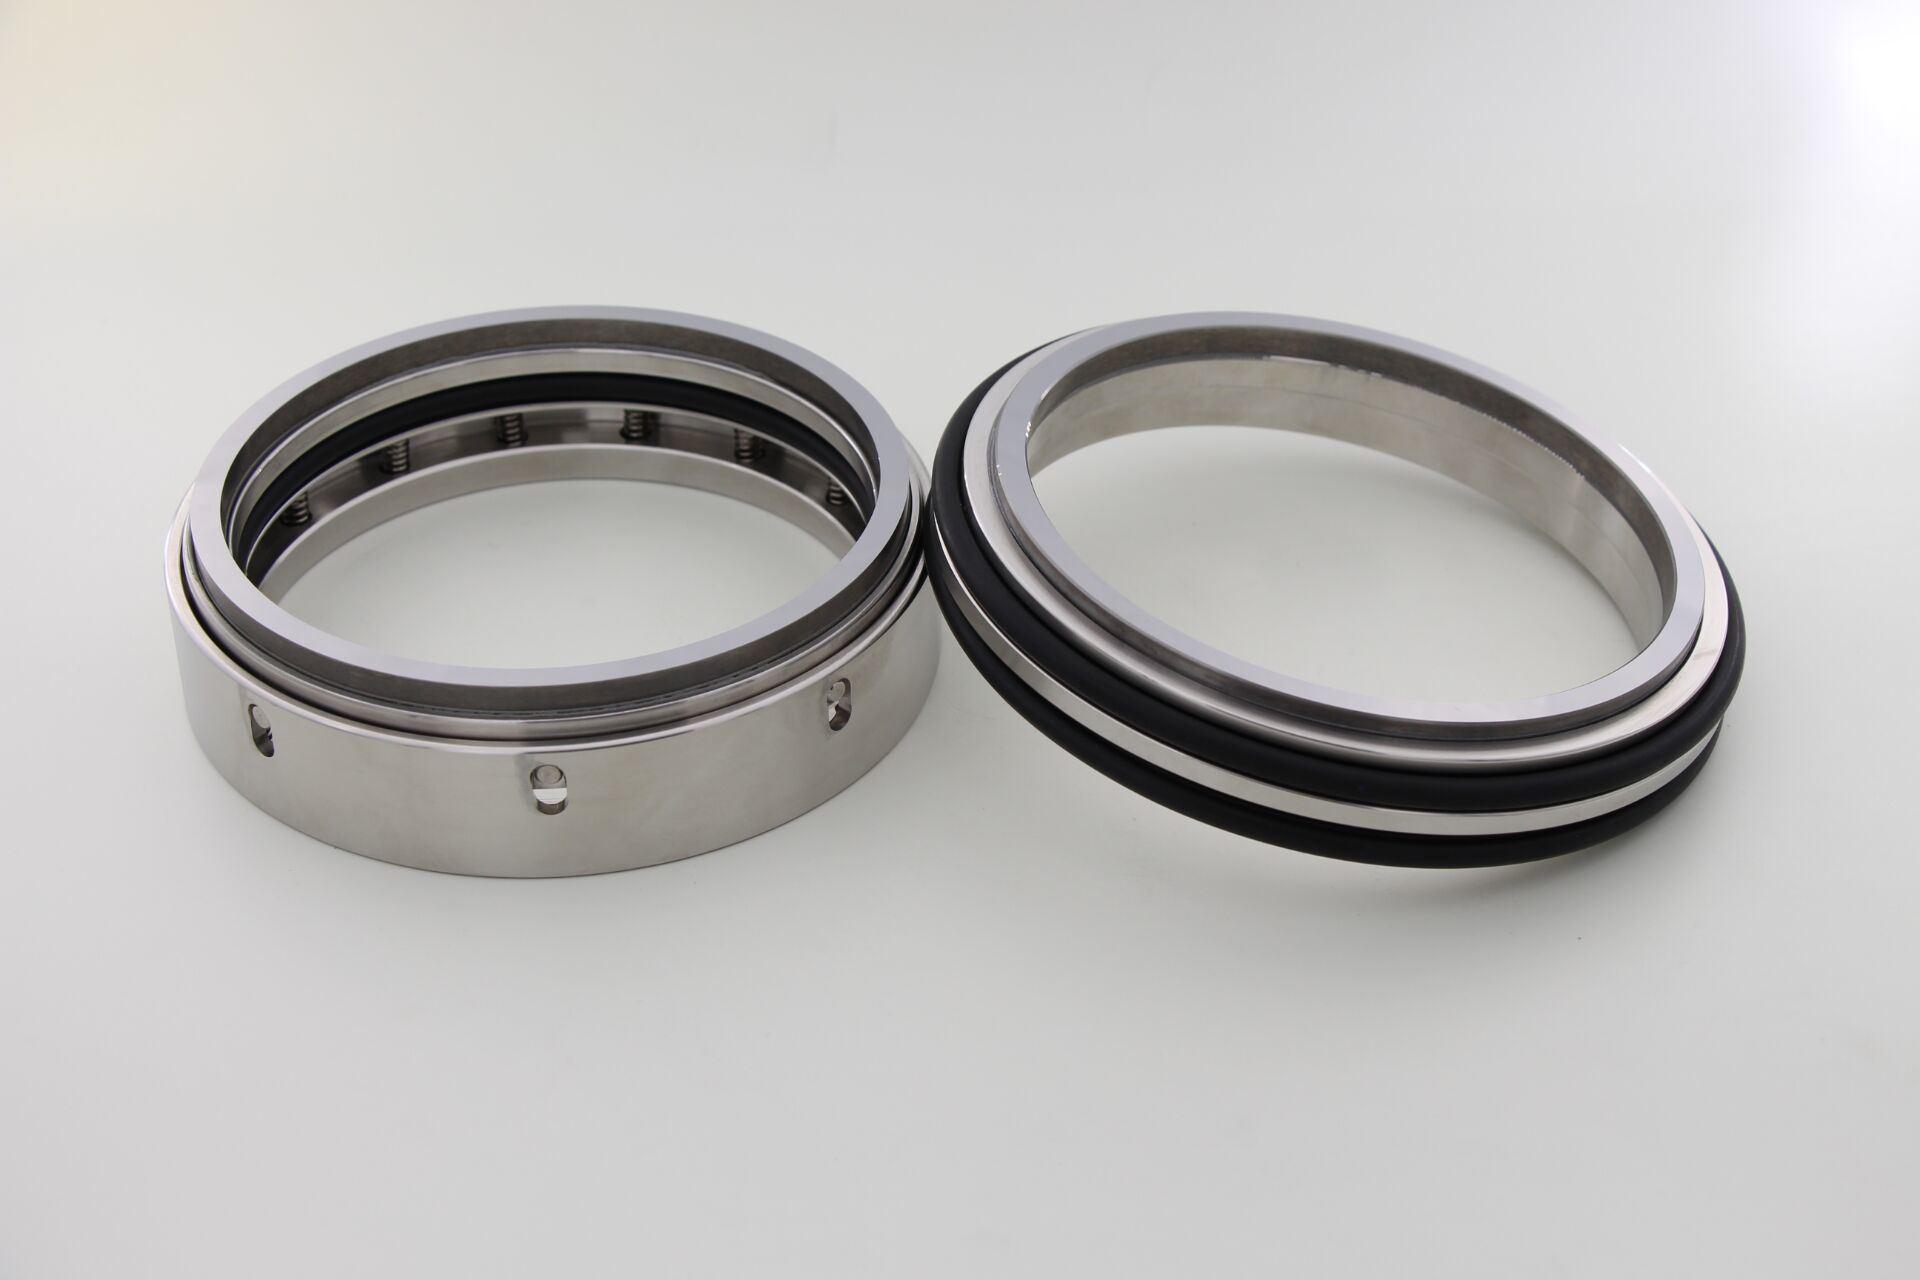 Mechanical-Seal-Flygt-7115-Pump-Seal-Grindex-Mody-Pump-Seal